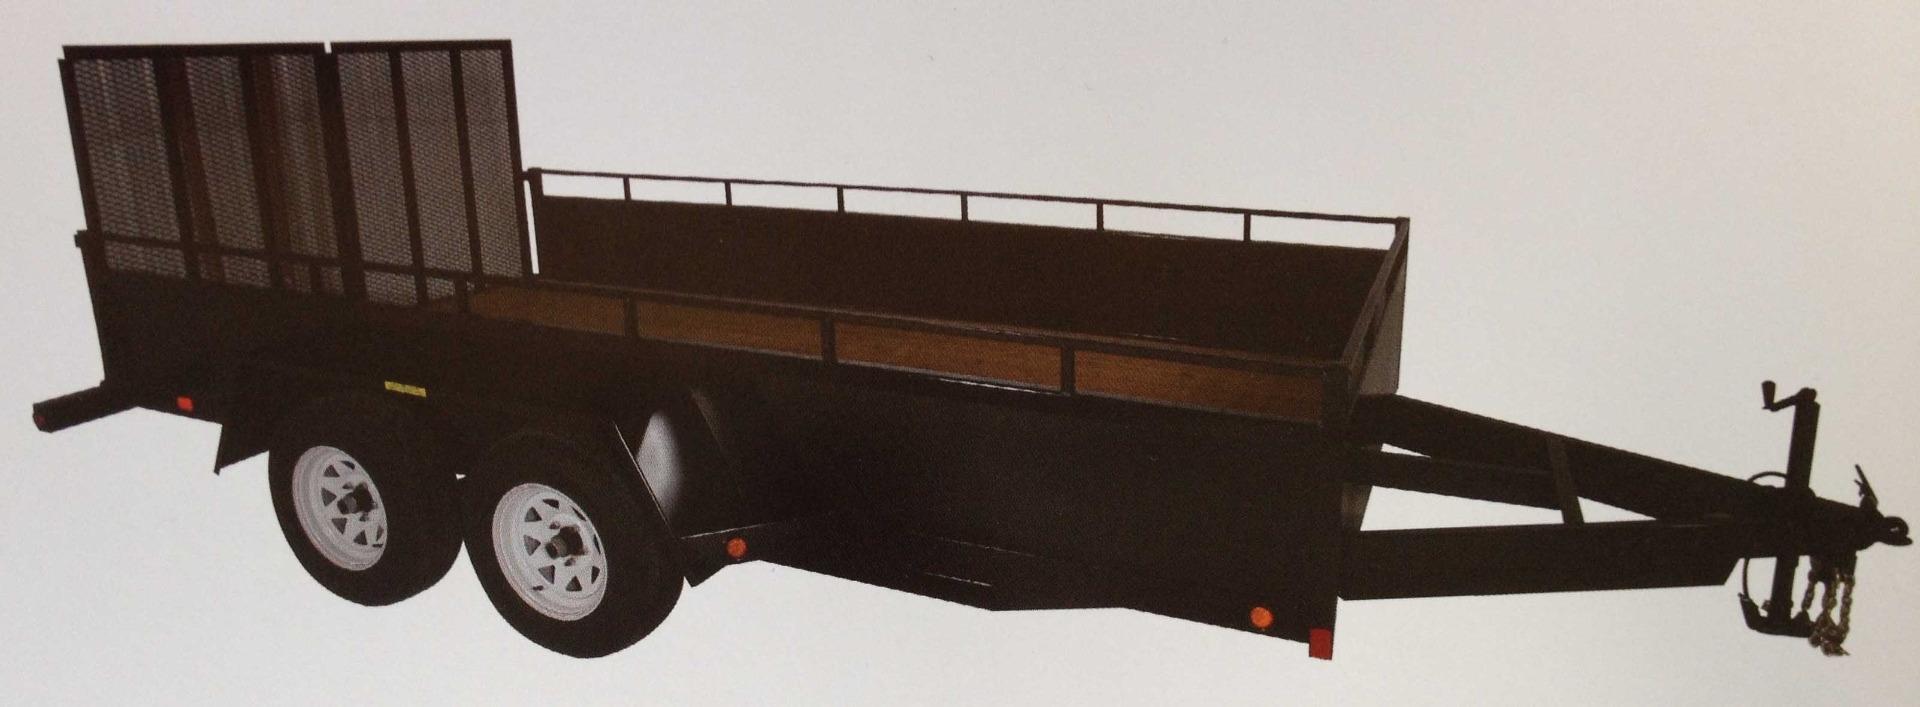 "JDJ General Duty Landscape Tandem Trailer (6'8"" W x 14' L) GDLT 8014"